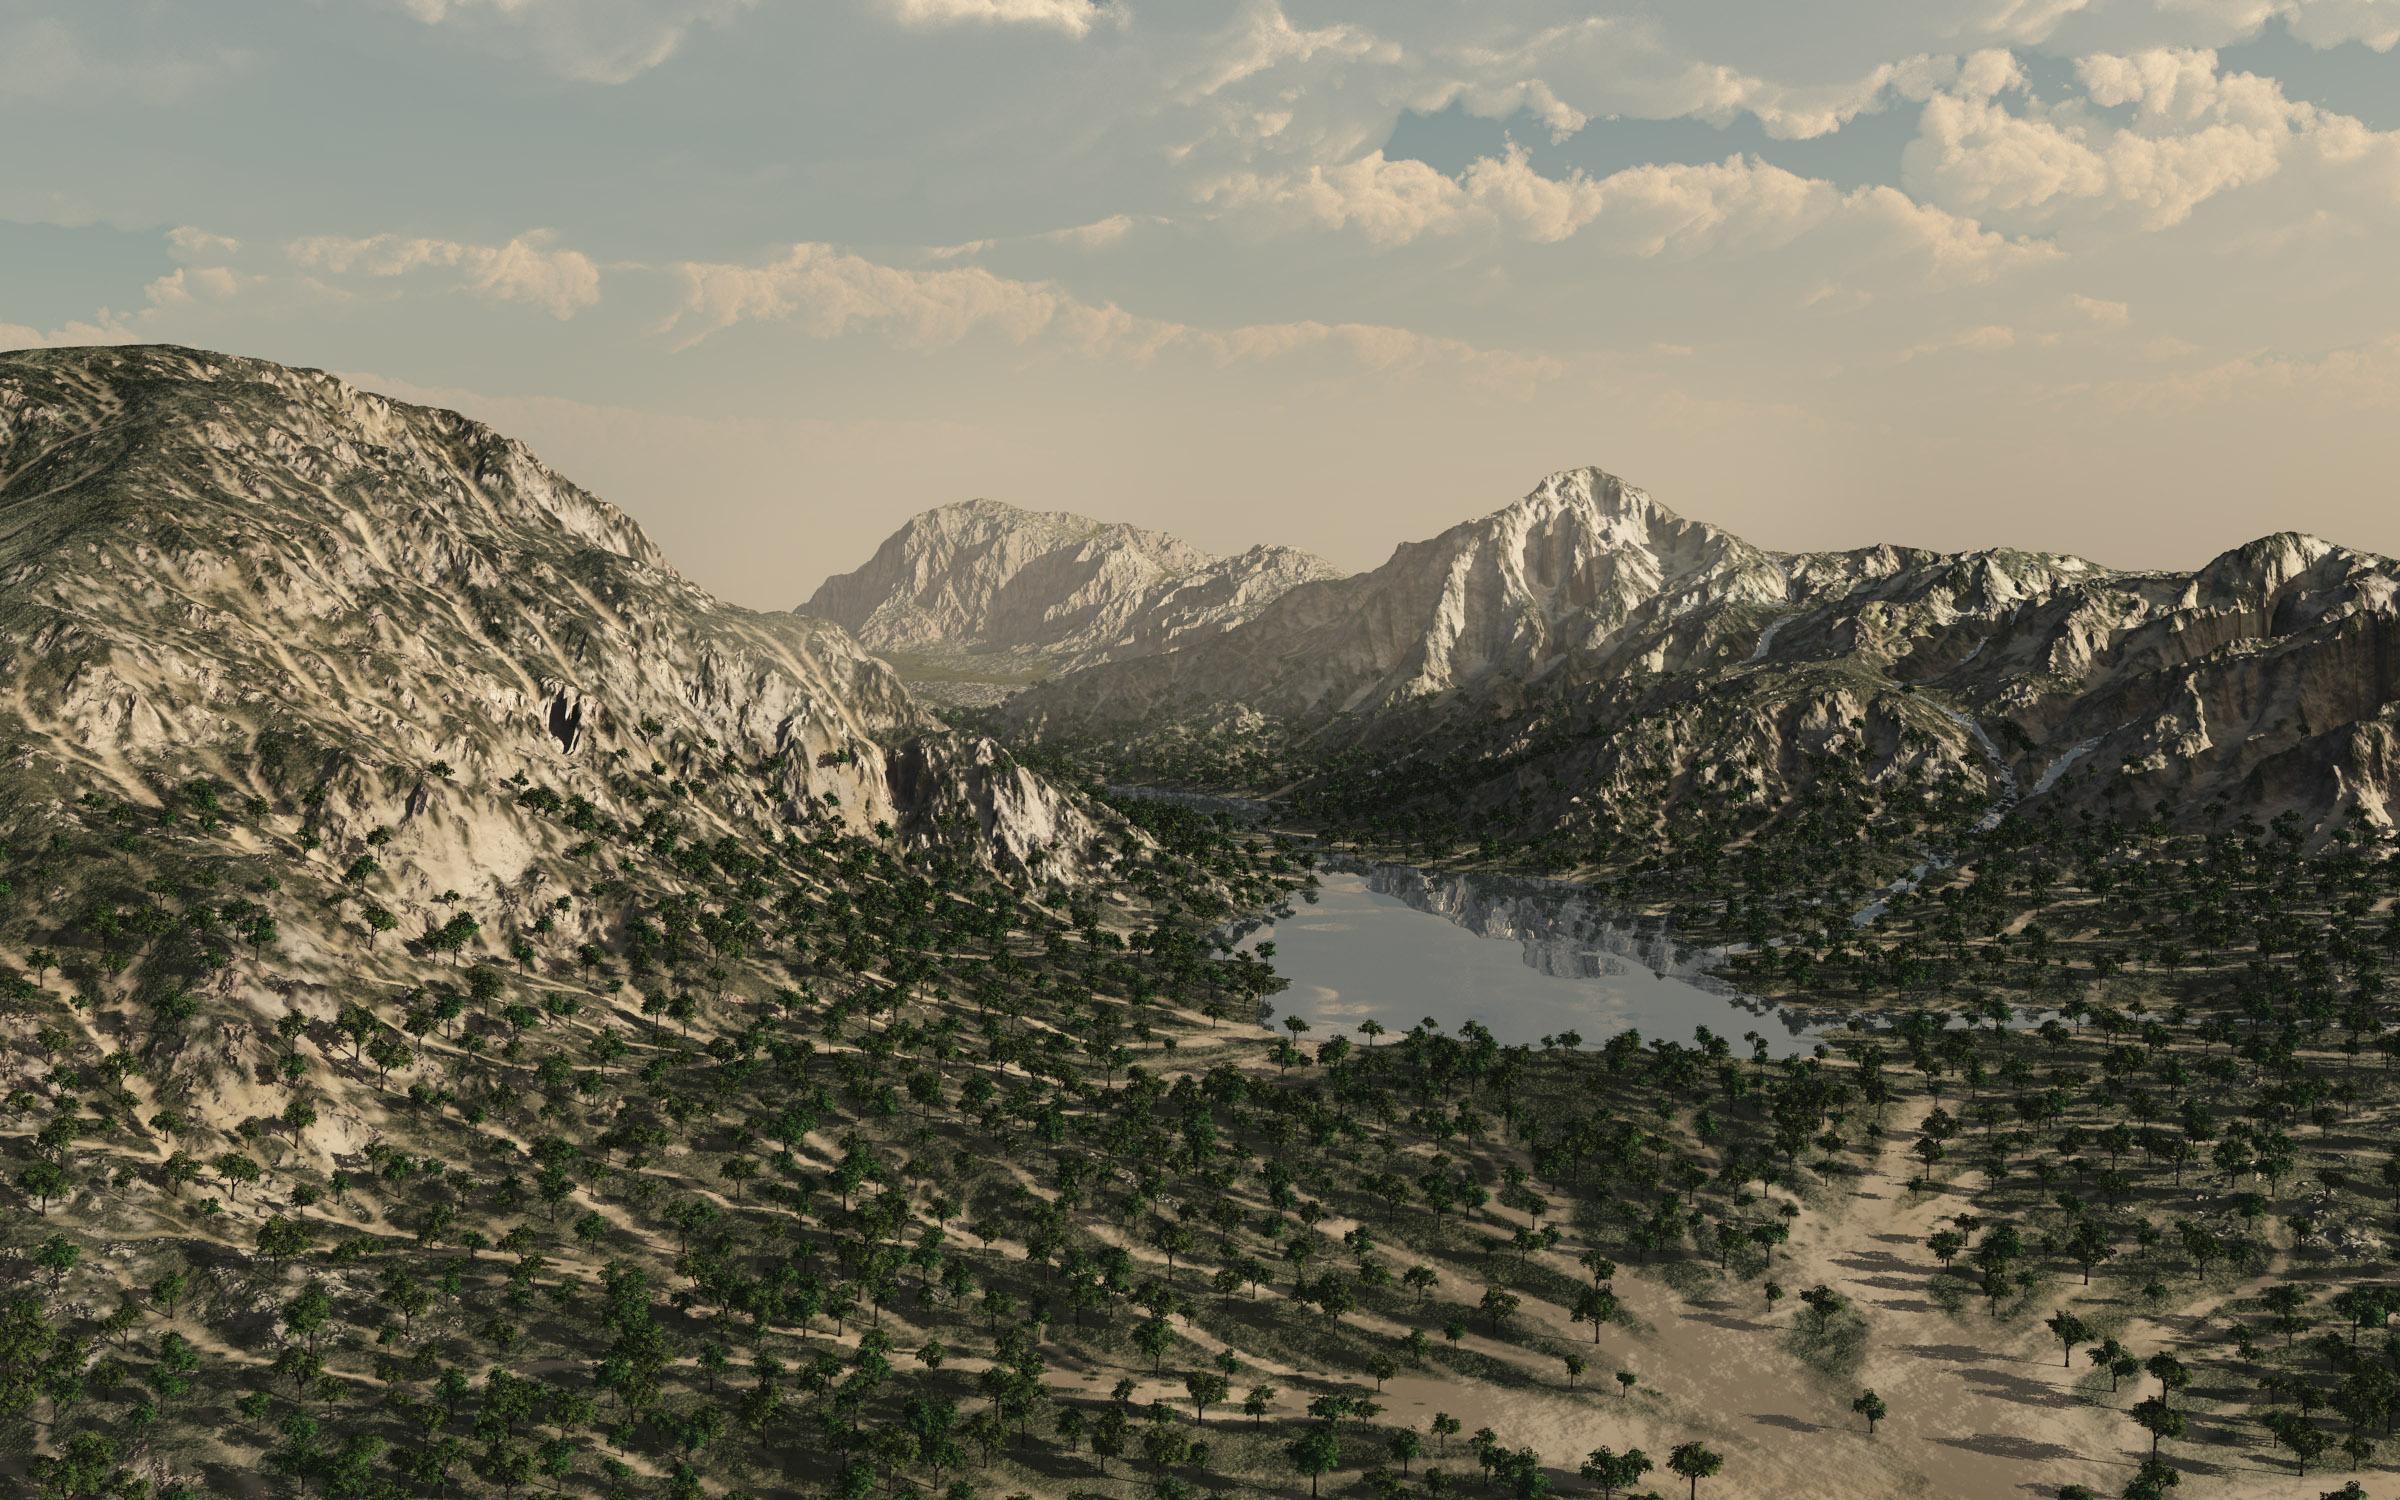 v_landscape1.jpg